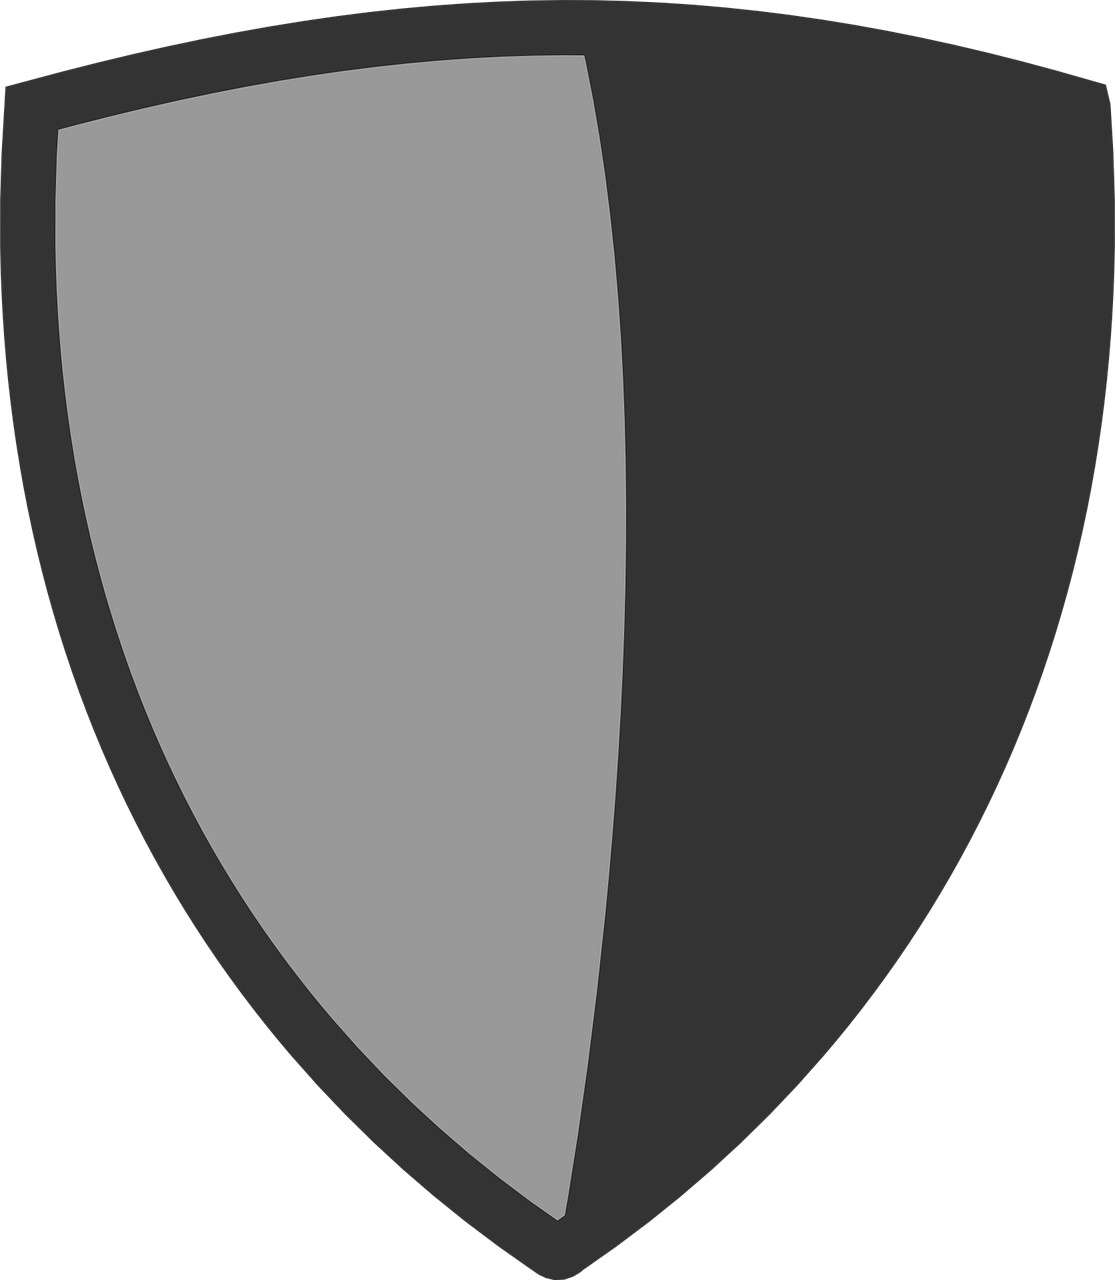 Icone d'un bouclier